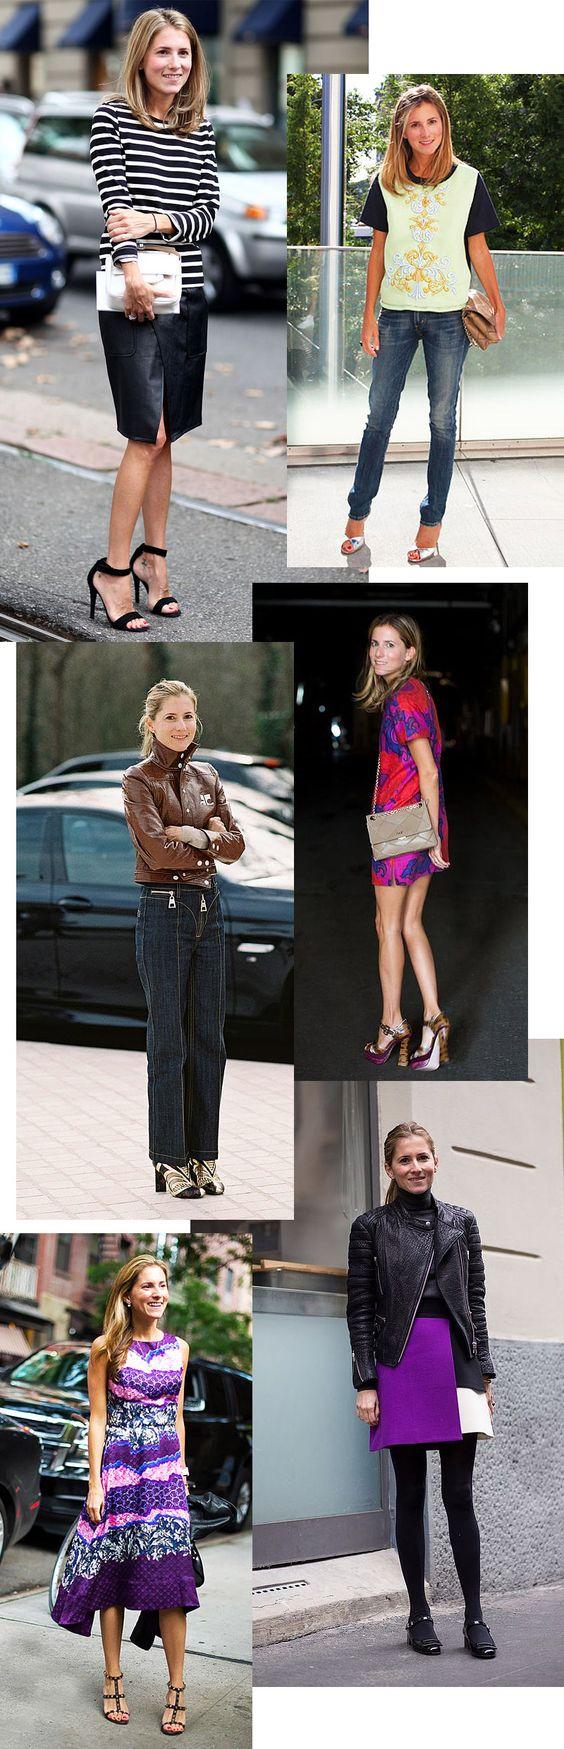 living-gazette-barbara-resende-moda-estilo-marina-larroude-teen-vogue-street-style